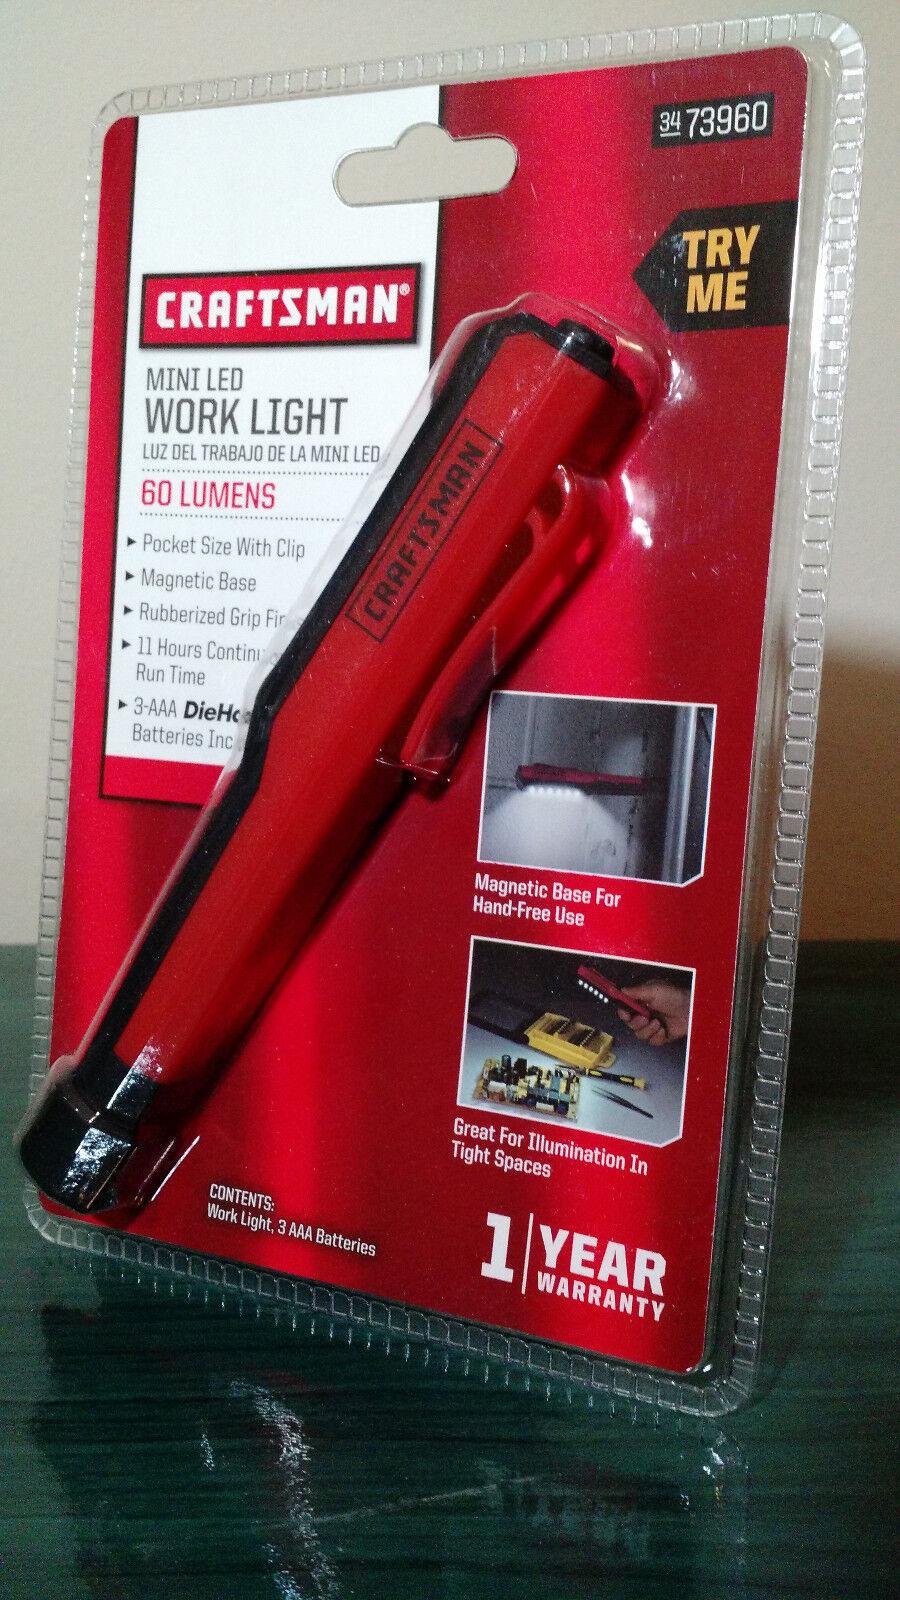 CRAFTSMAN MINI LED WORK LIGHT 60 LUMENS MODEL 73960